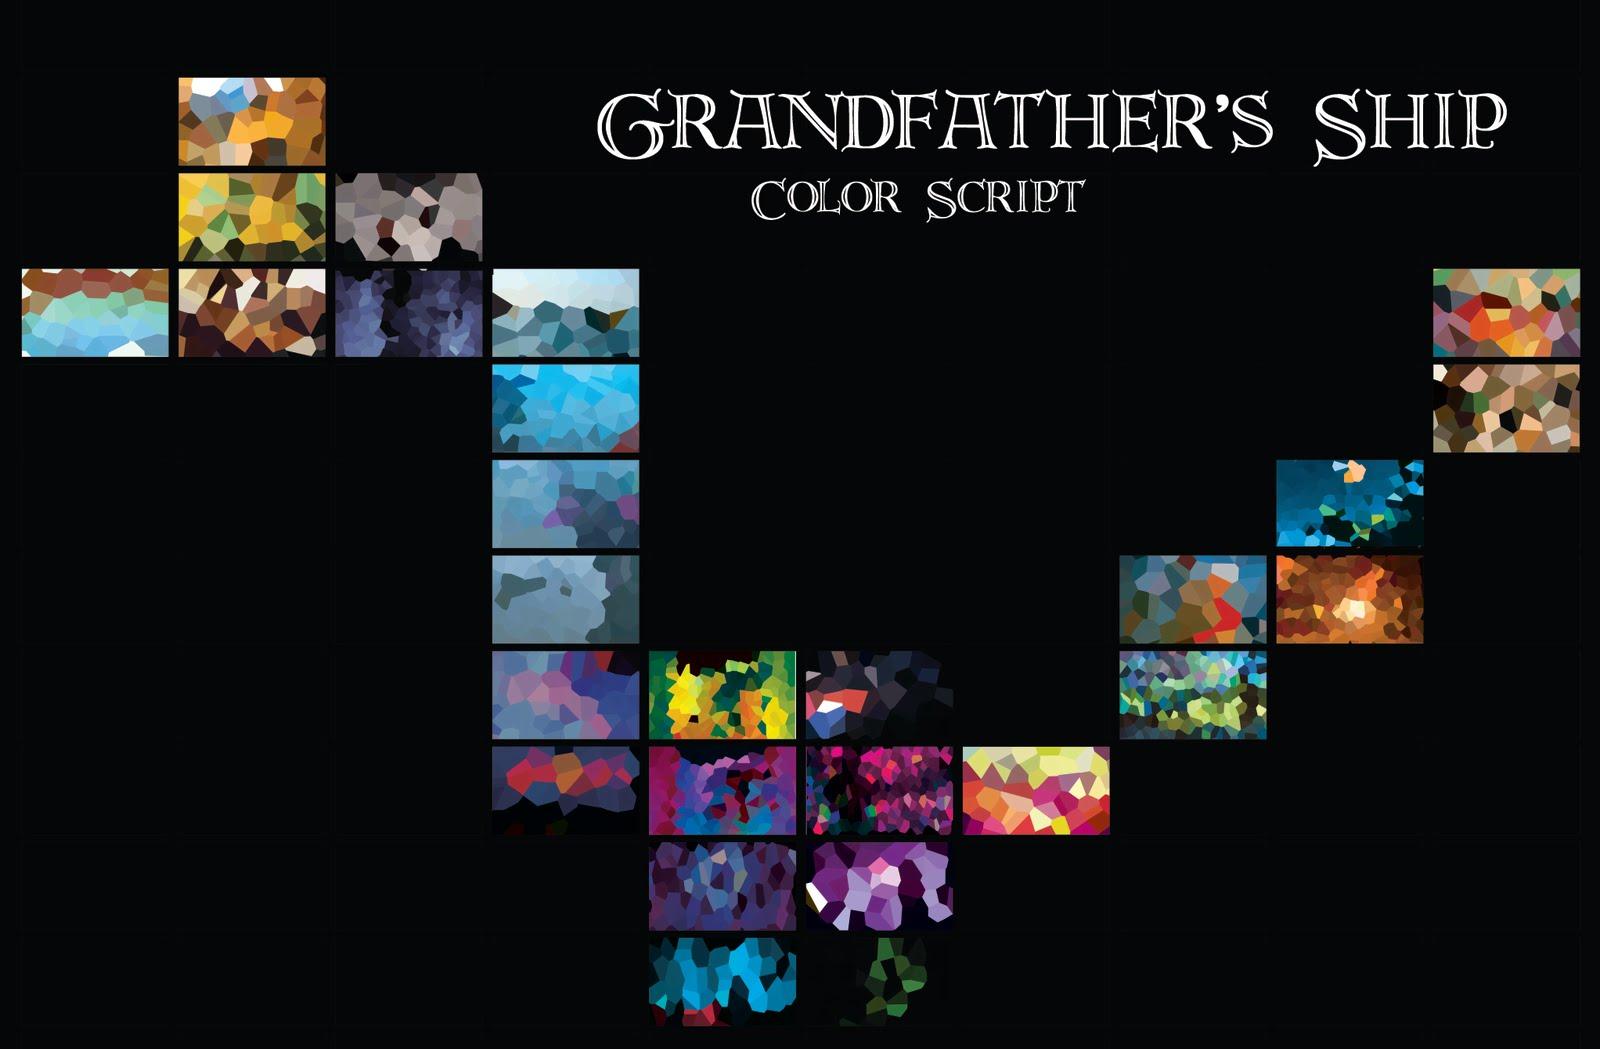 cinematography colour